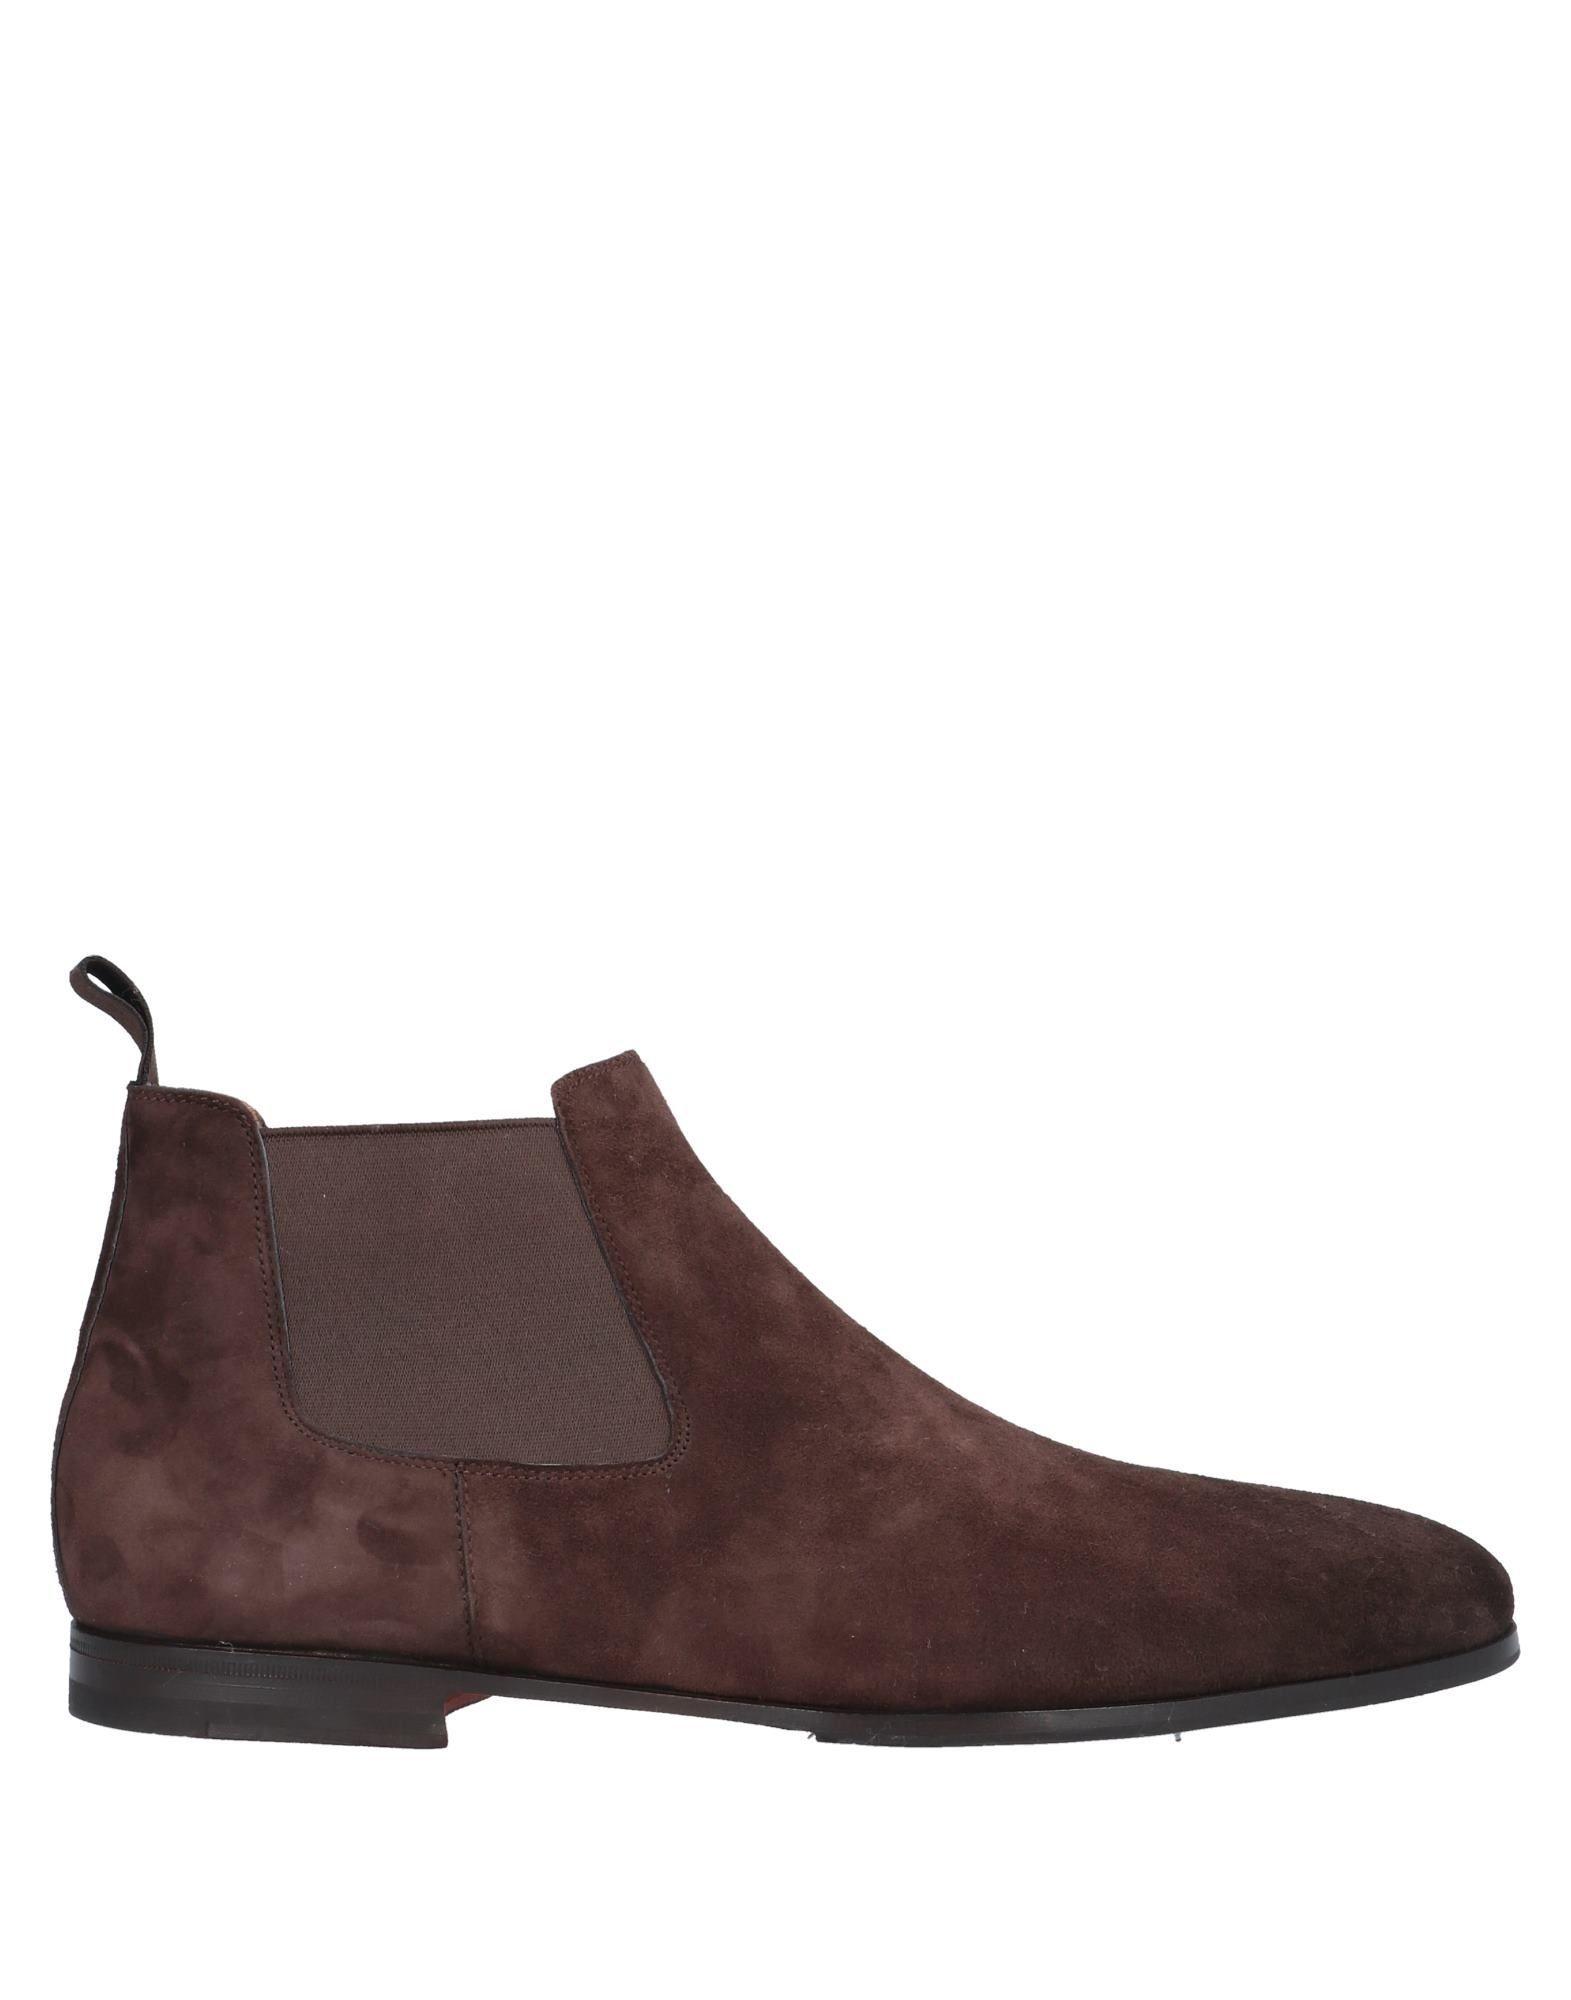 Santoni Man Ankle boots Cocoa Leather